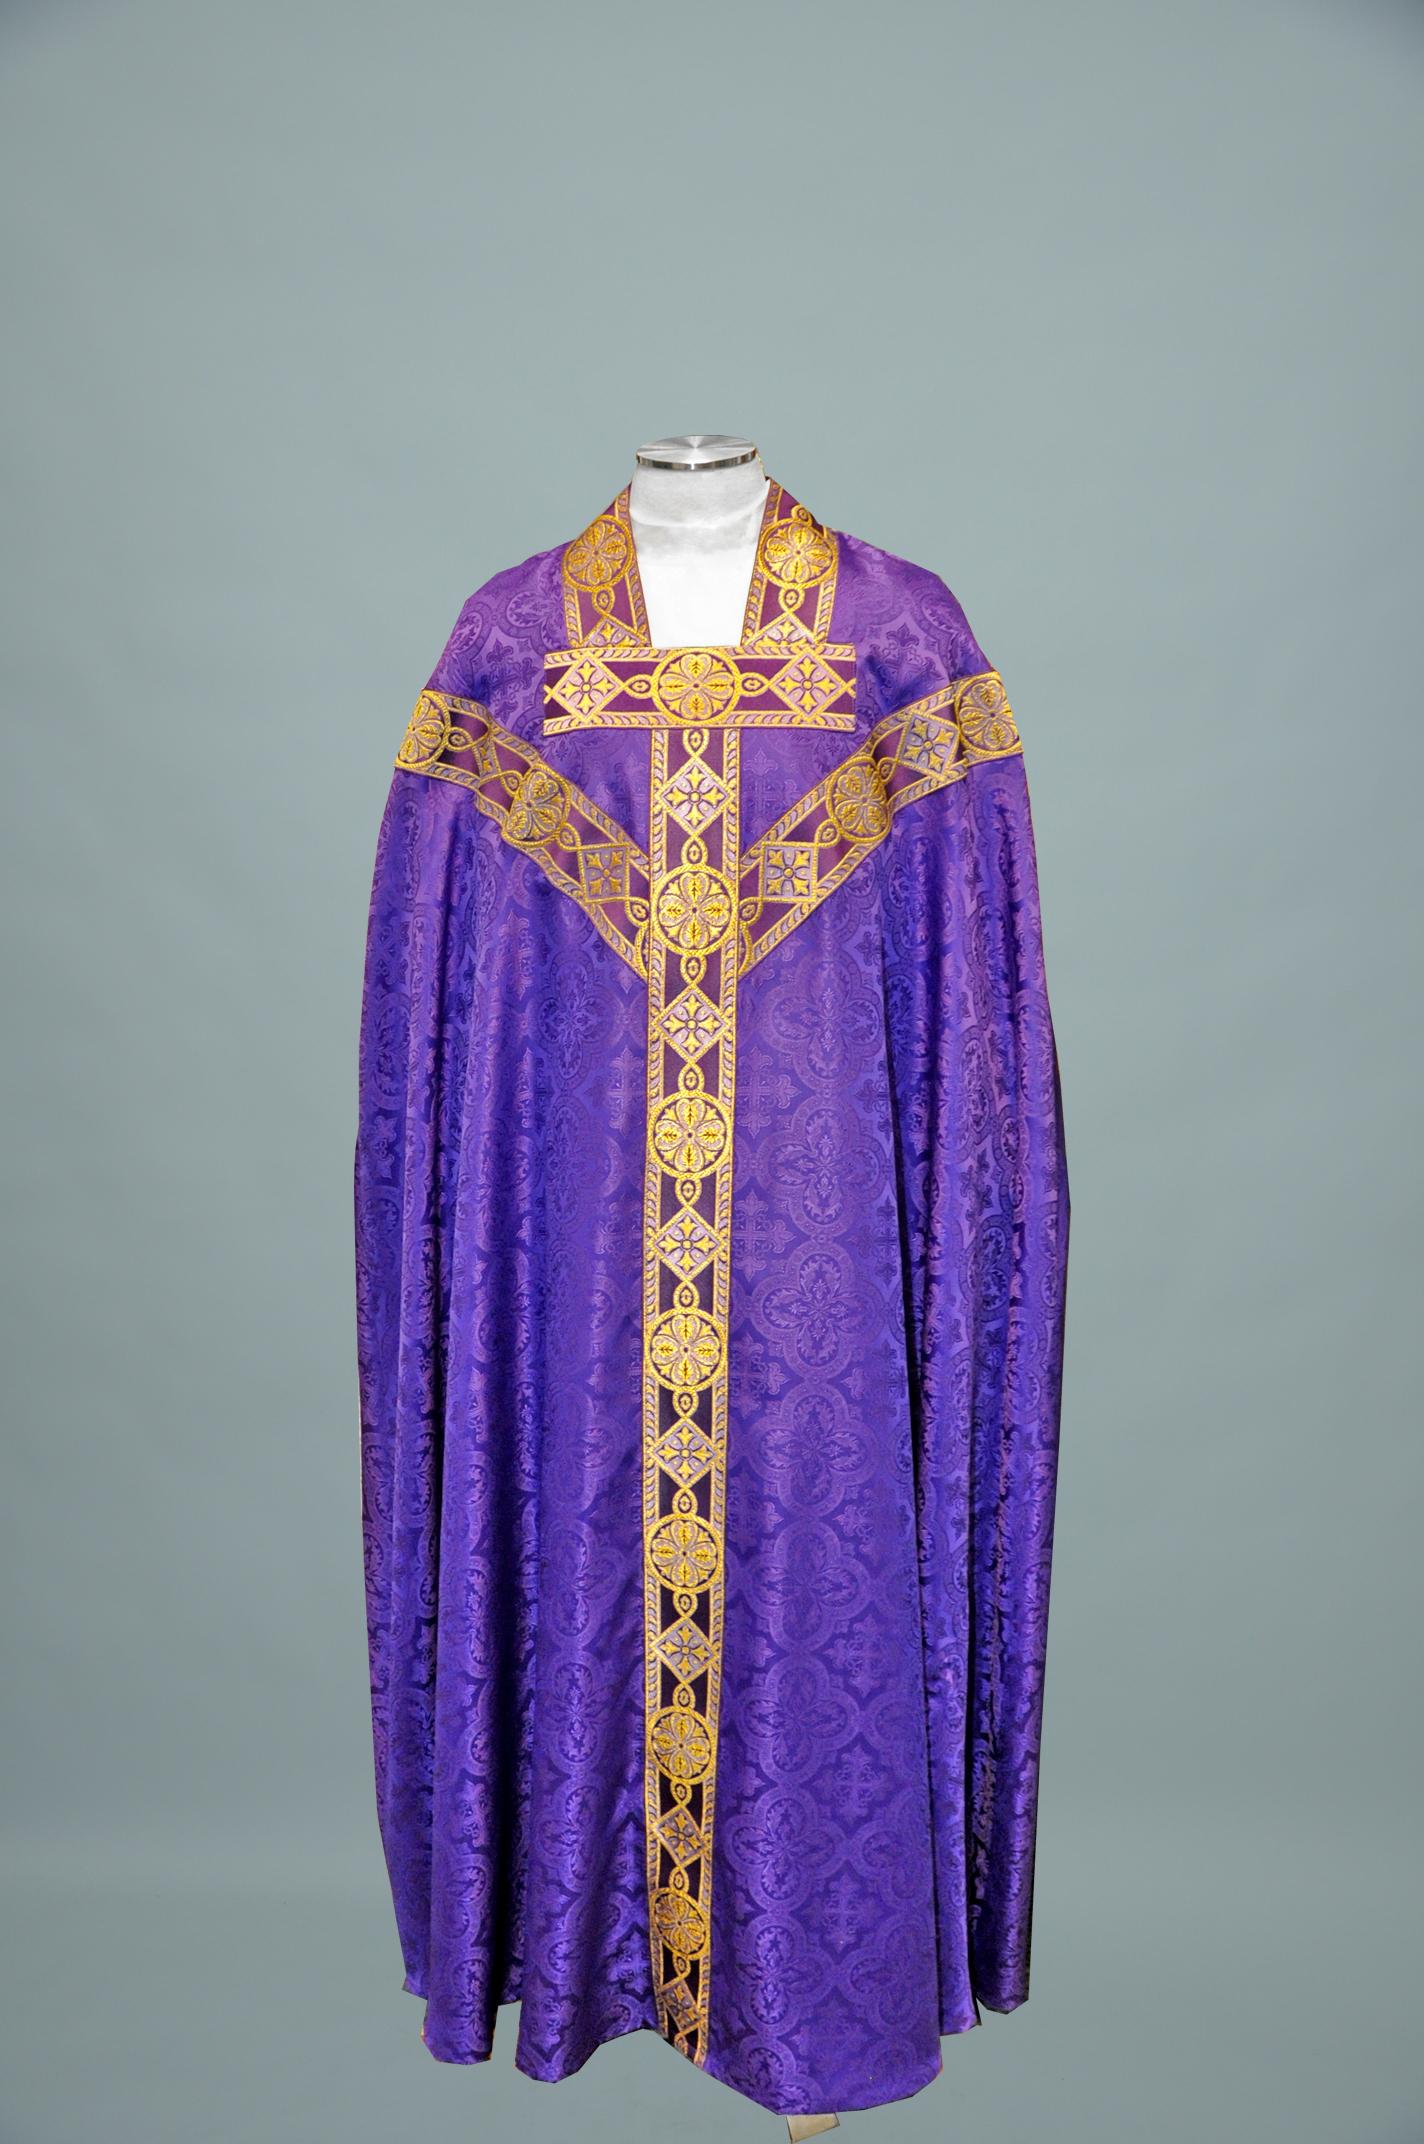 Conicle Chasuble Davinci Purple W 1180 Purple gold (f) 1.jpg